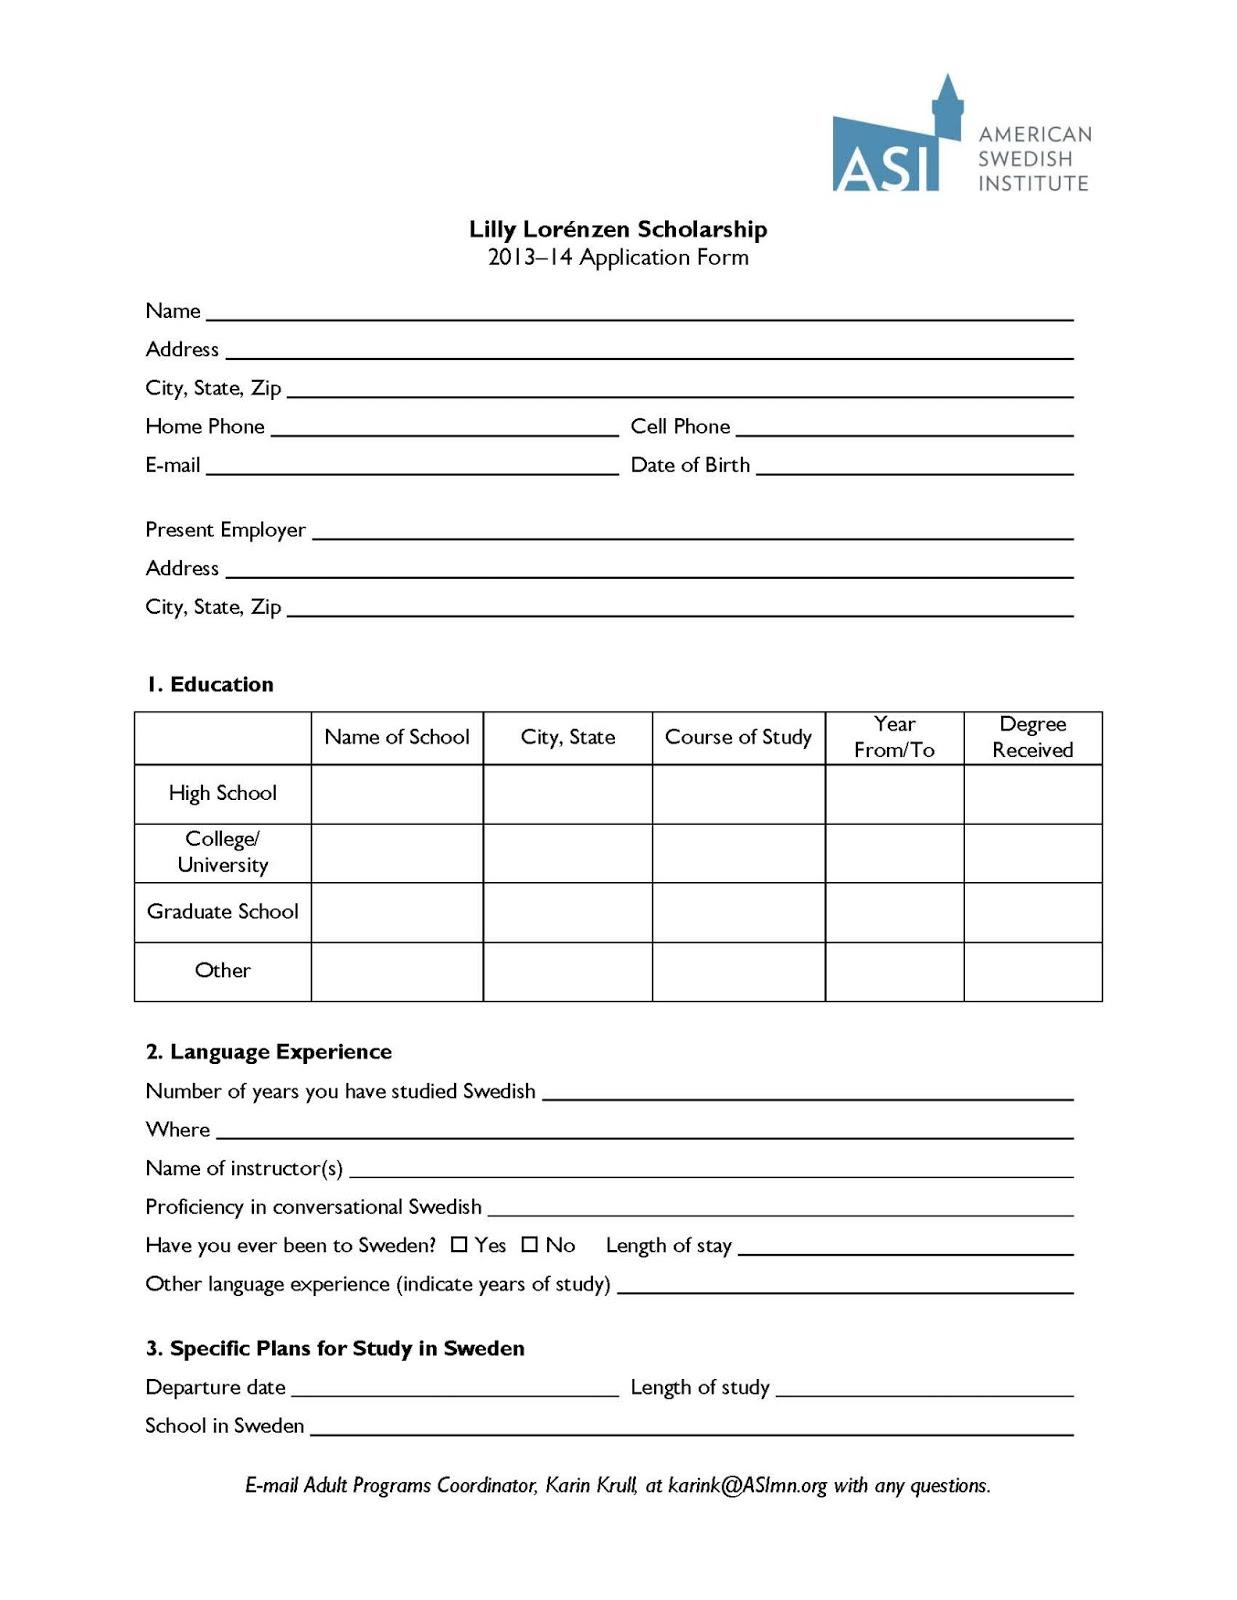 scholarship application no essay 91 121 113 106 college scholarships search and application fastweb scholarship application no essay